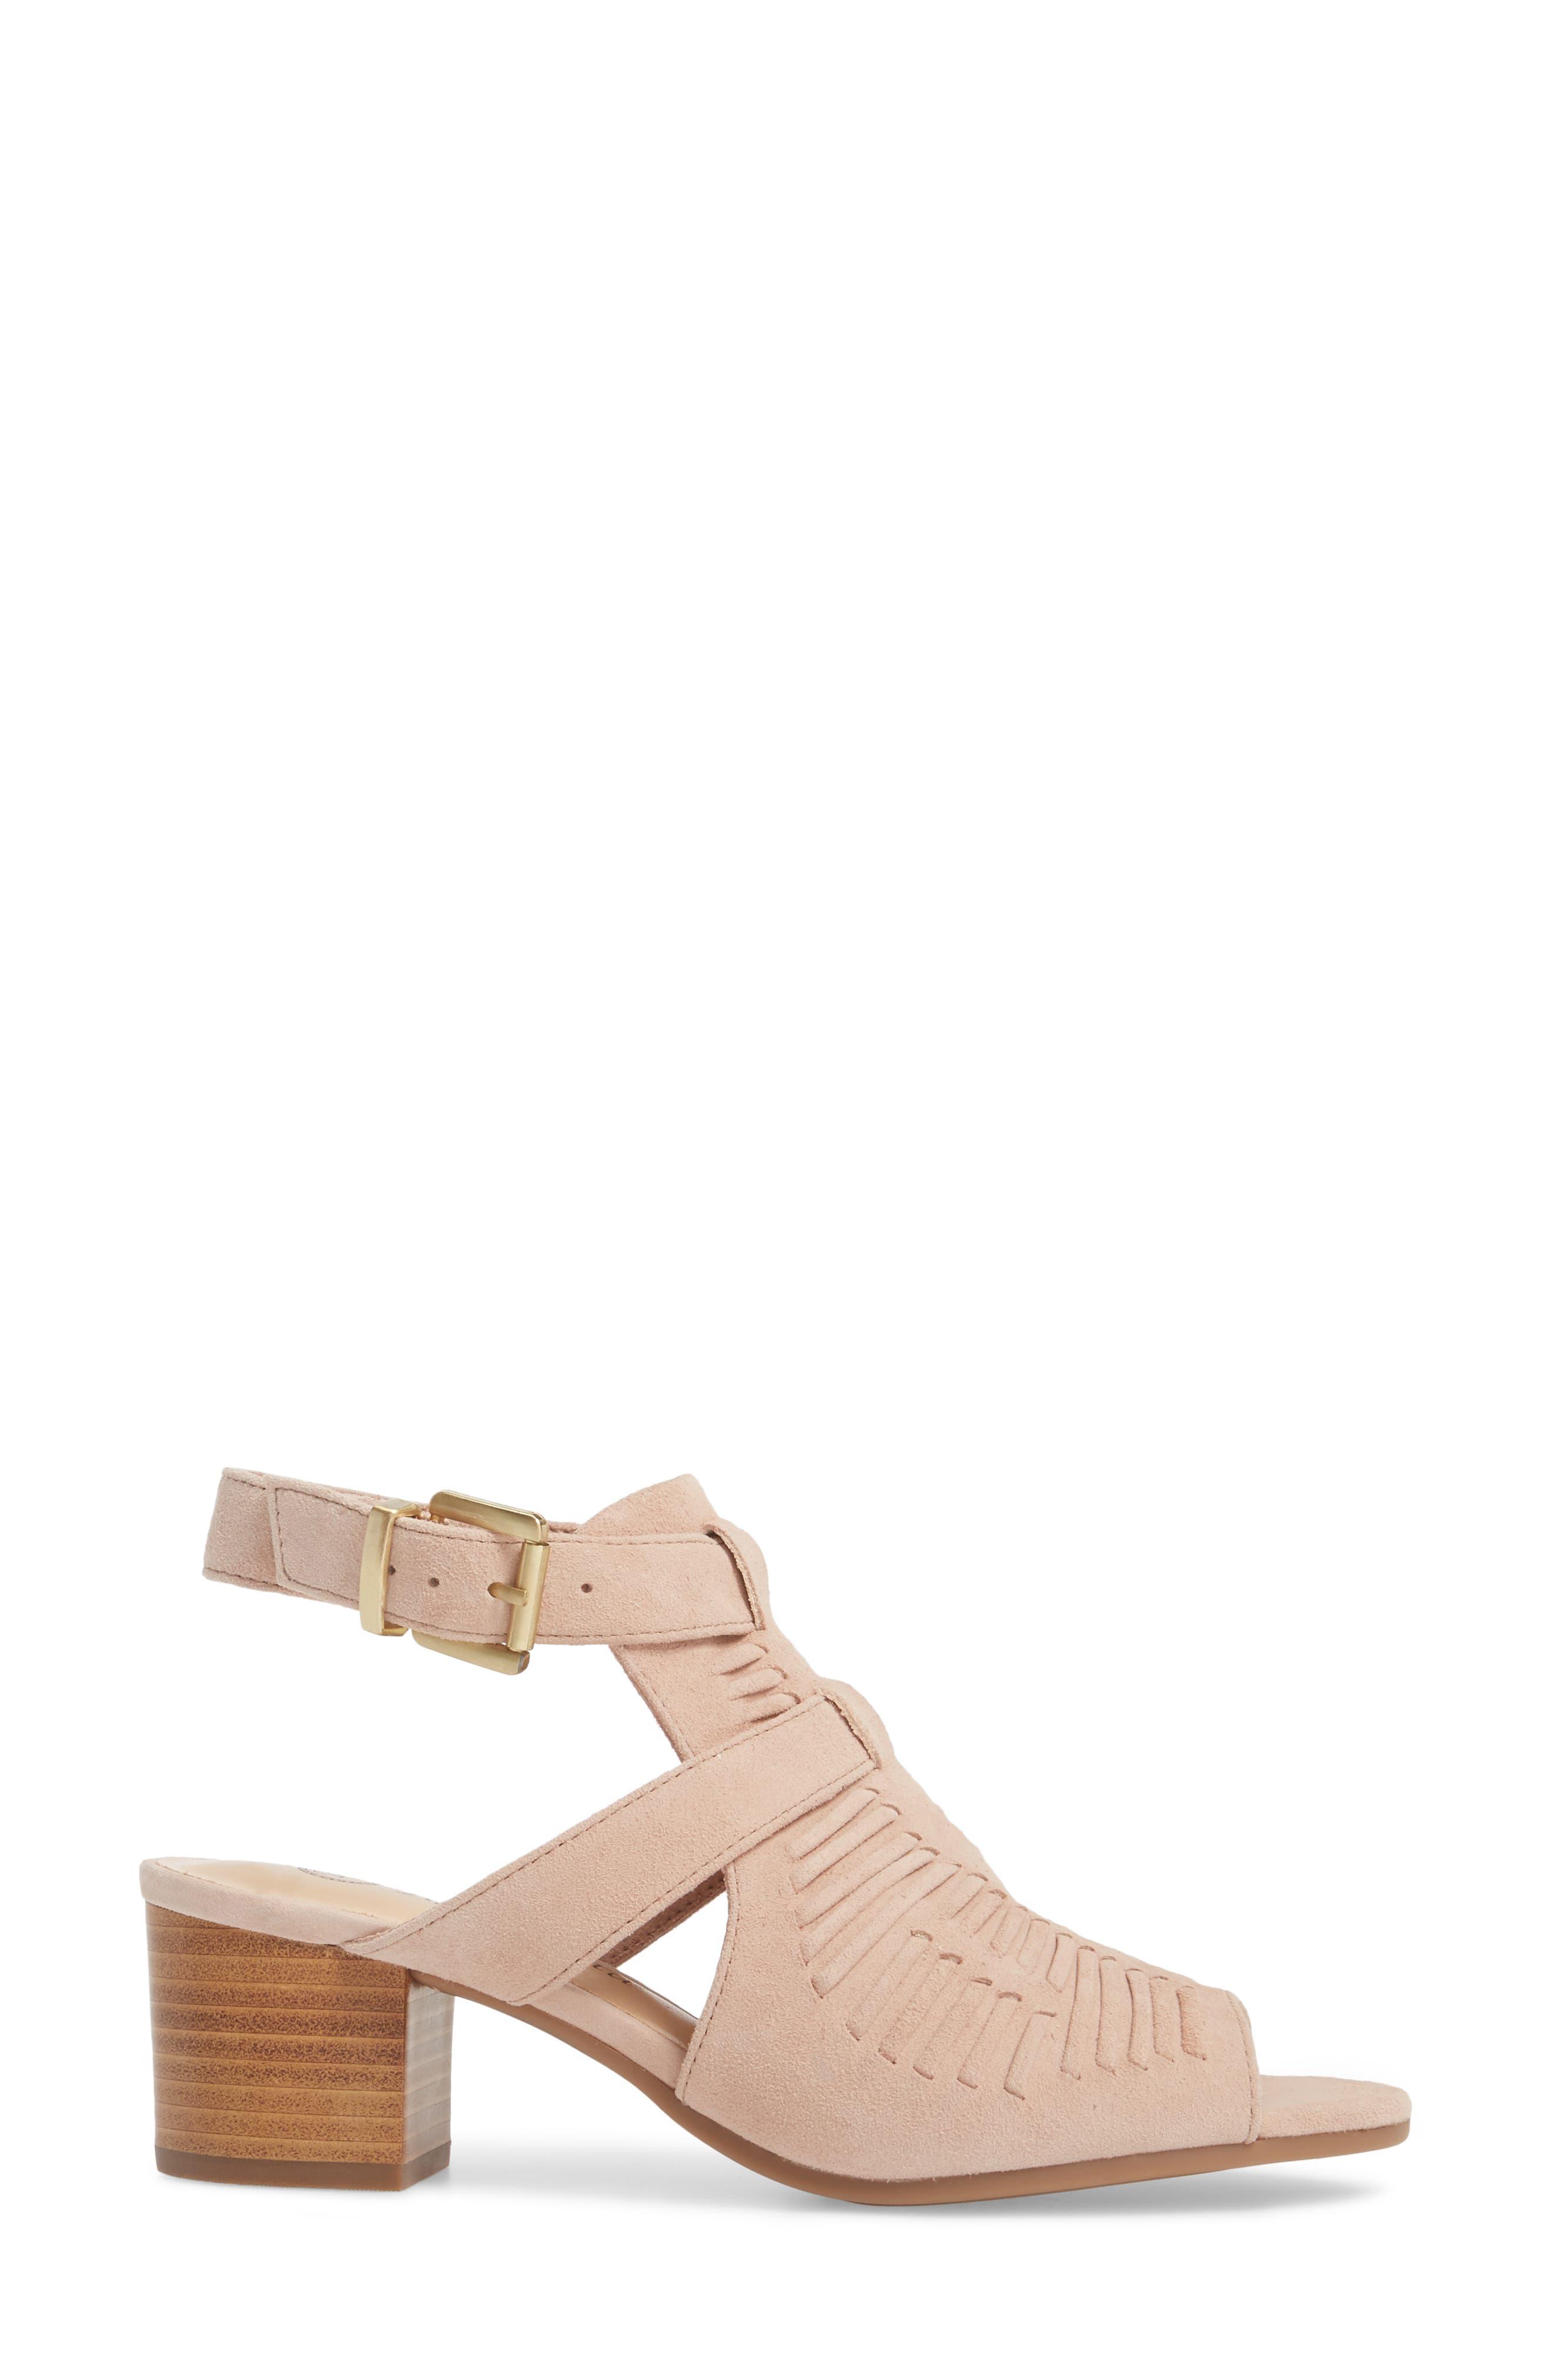 Finley Ankle Strap Sandal,                             Alternate thumbnail 15, color,